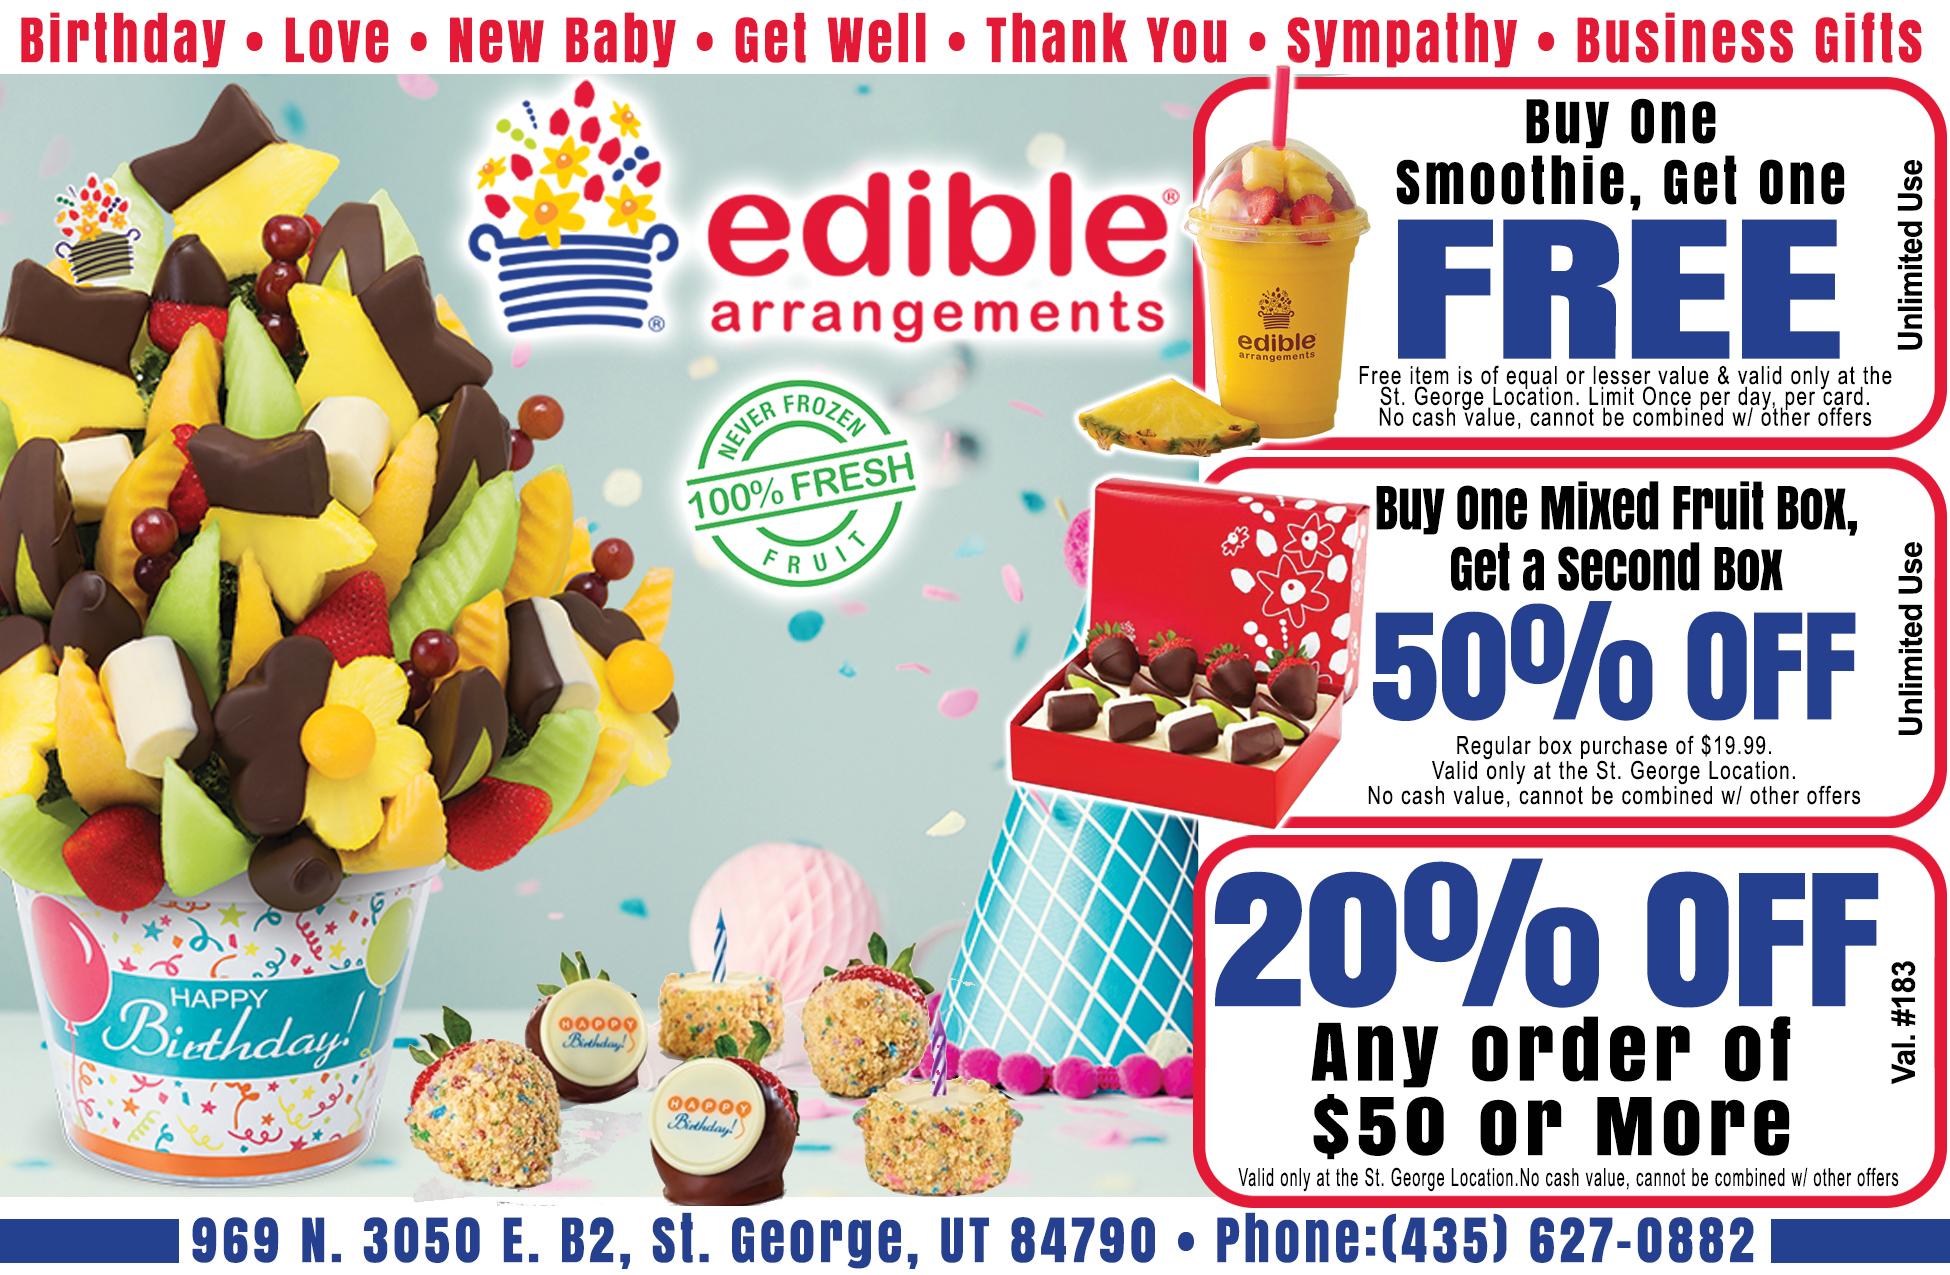 Edible arrangements - fresh fruit decor